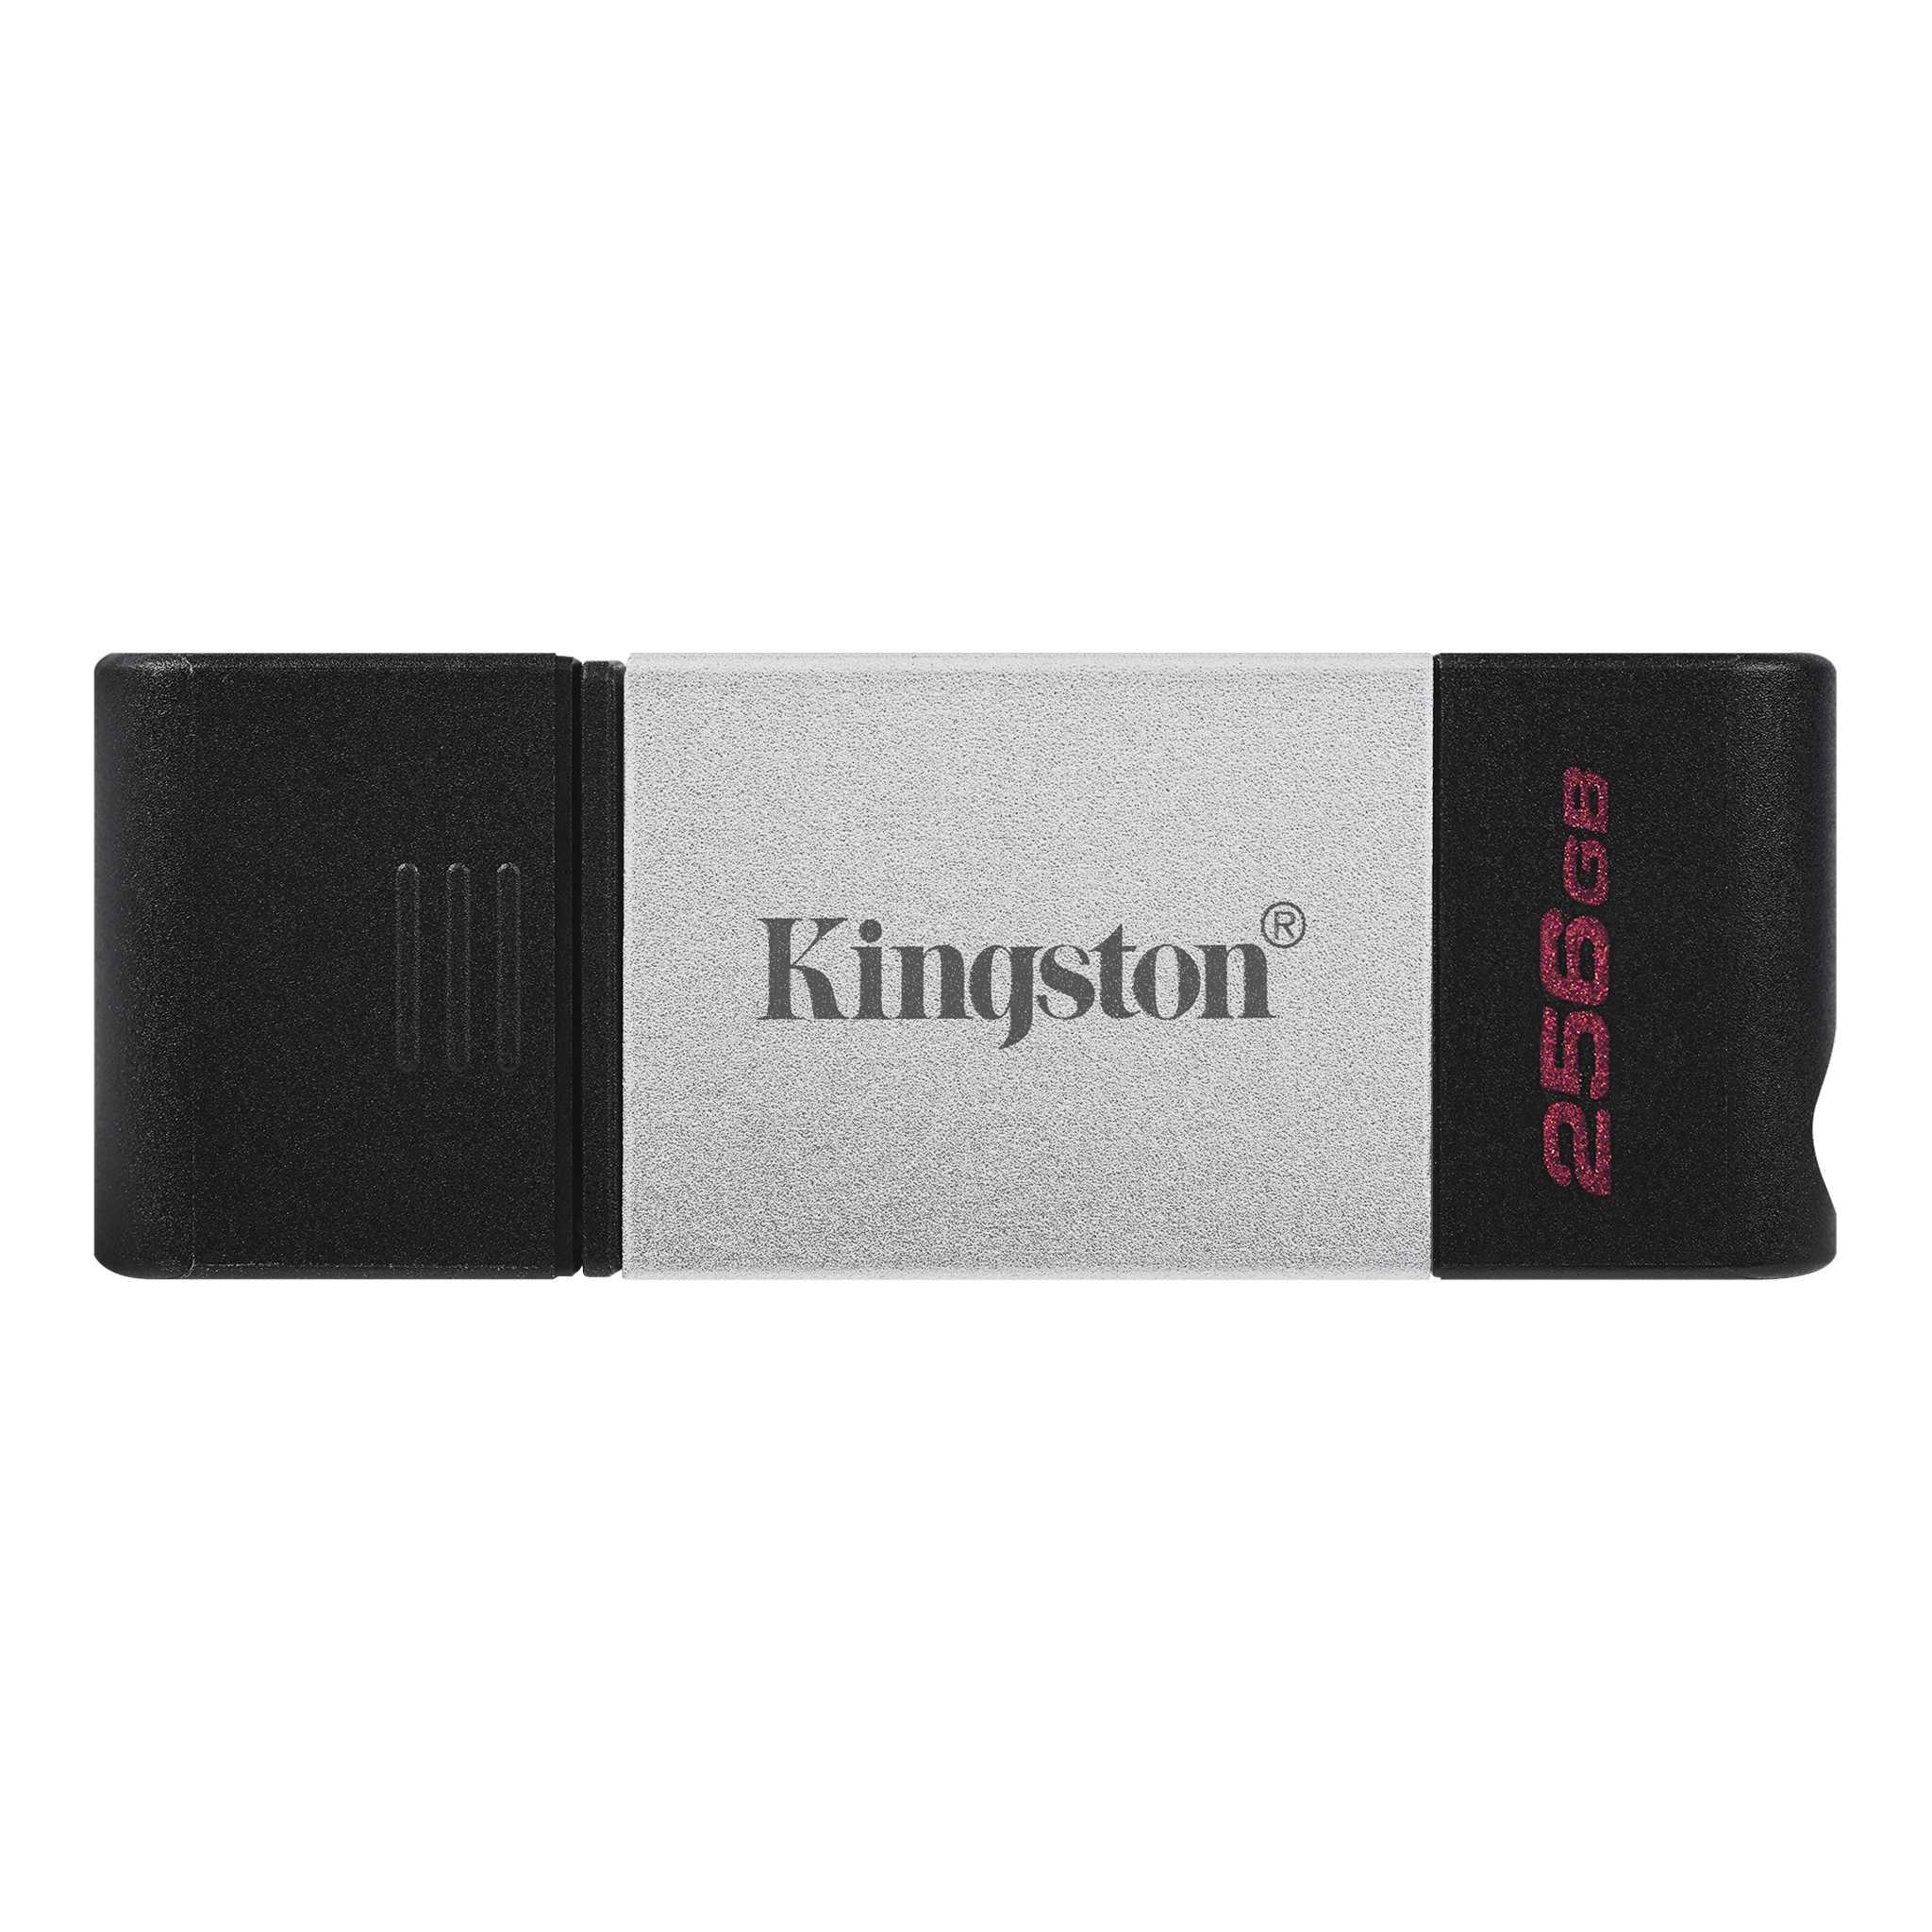 256GB Kingston DT80 USB-C 3.2 gen. 1 - DT80/256GB